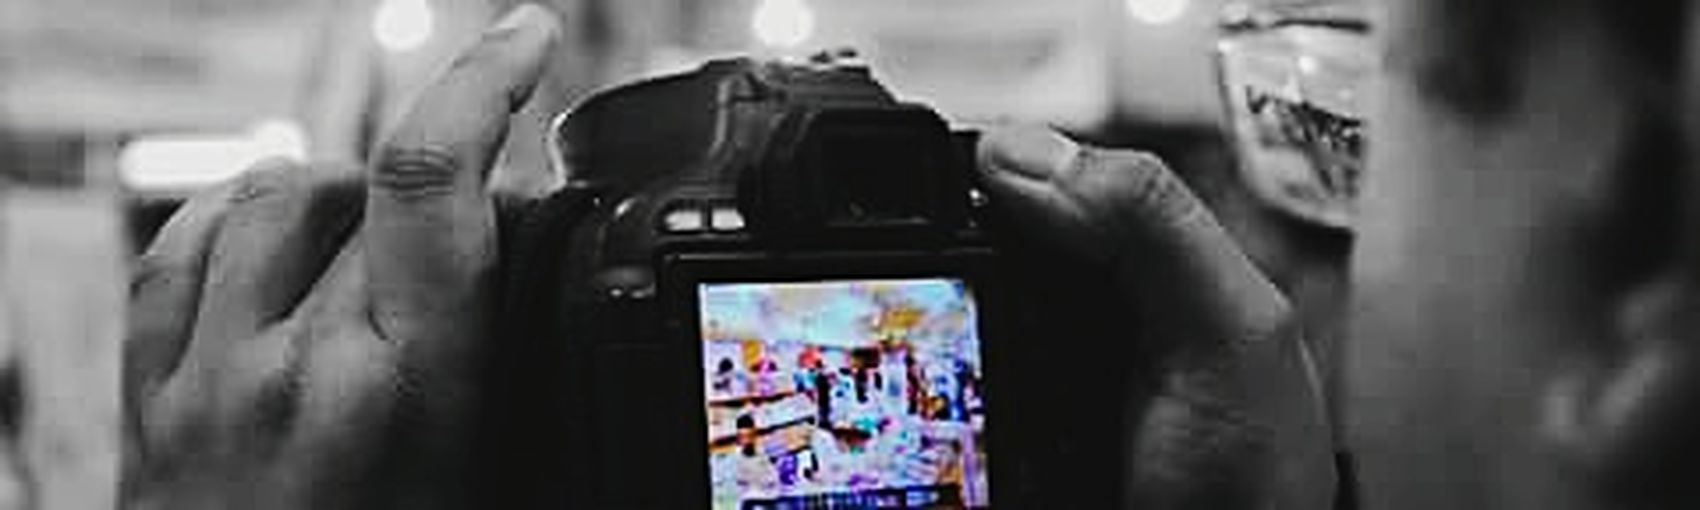 My Smartphone Life My Hobby Taking Photos Tadaa Community Eye4photography  EyeEm Best Shots EyeEm Gallery OpenEdit